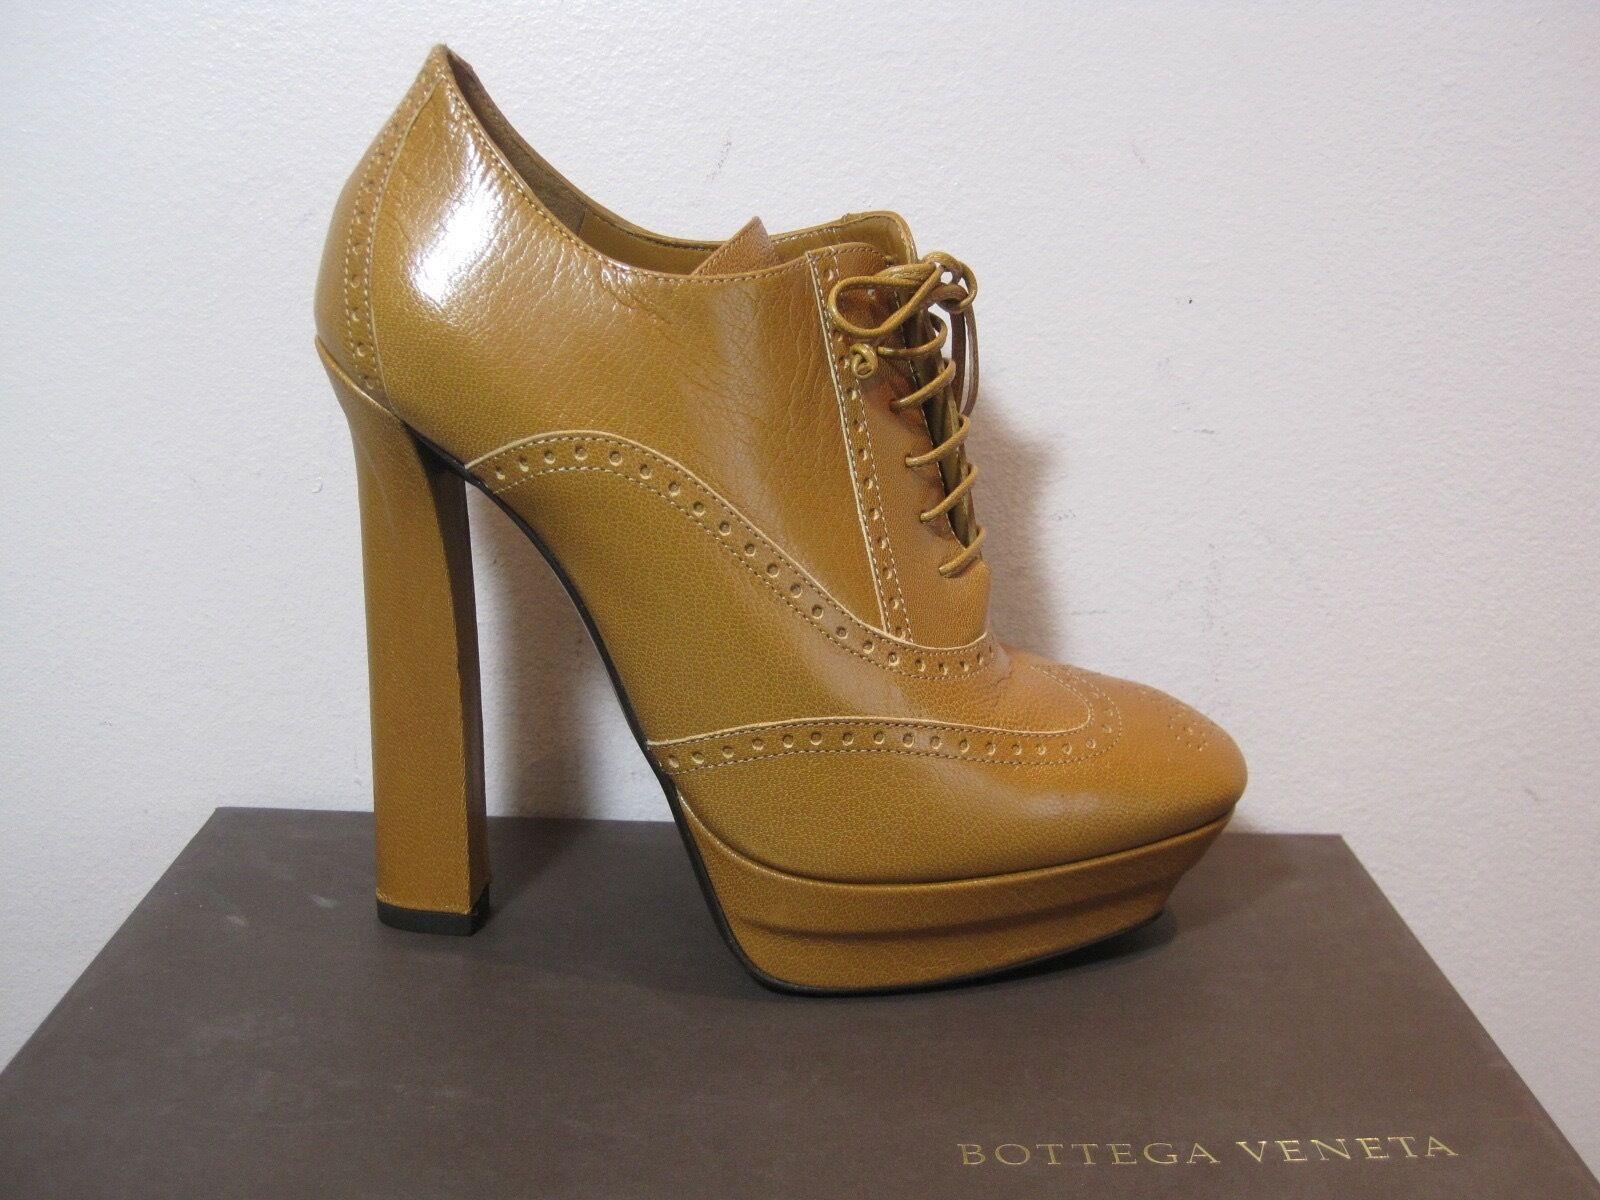 Bottega Veneta Kari Brown Oxford Lace Up Booties Boots 950 40 10